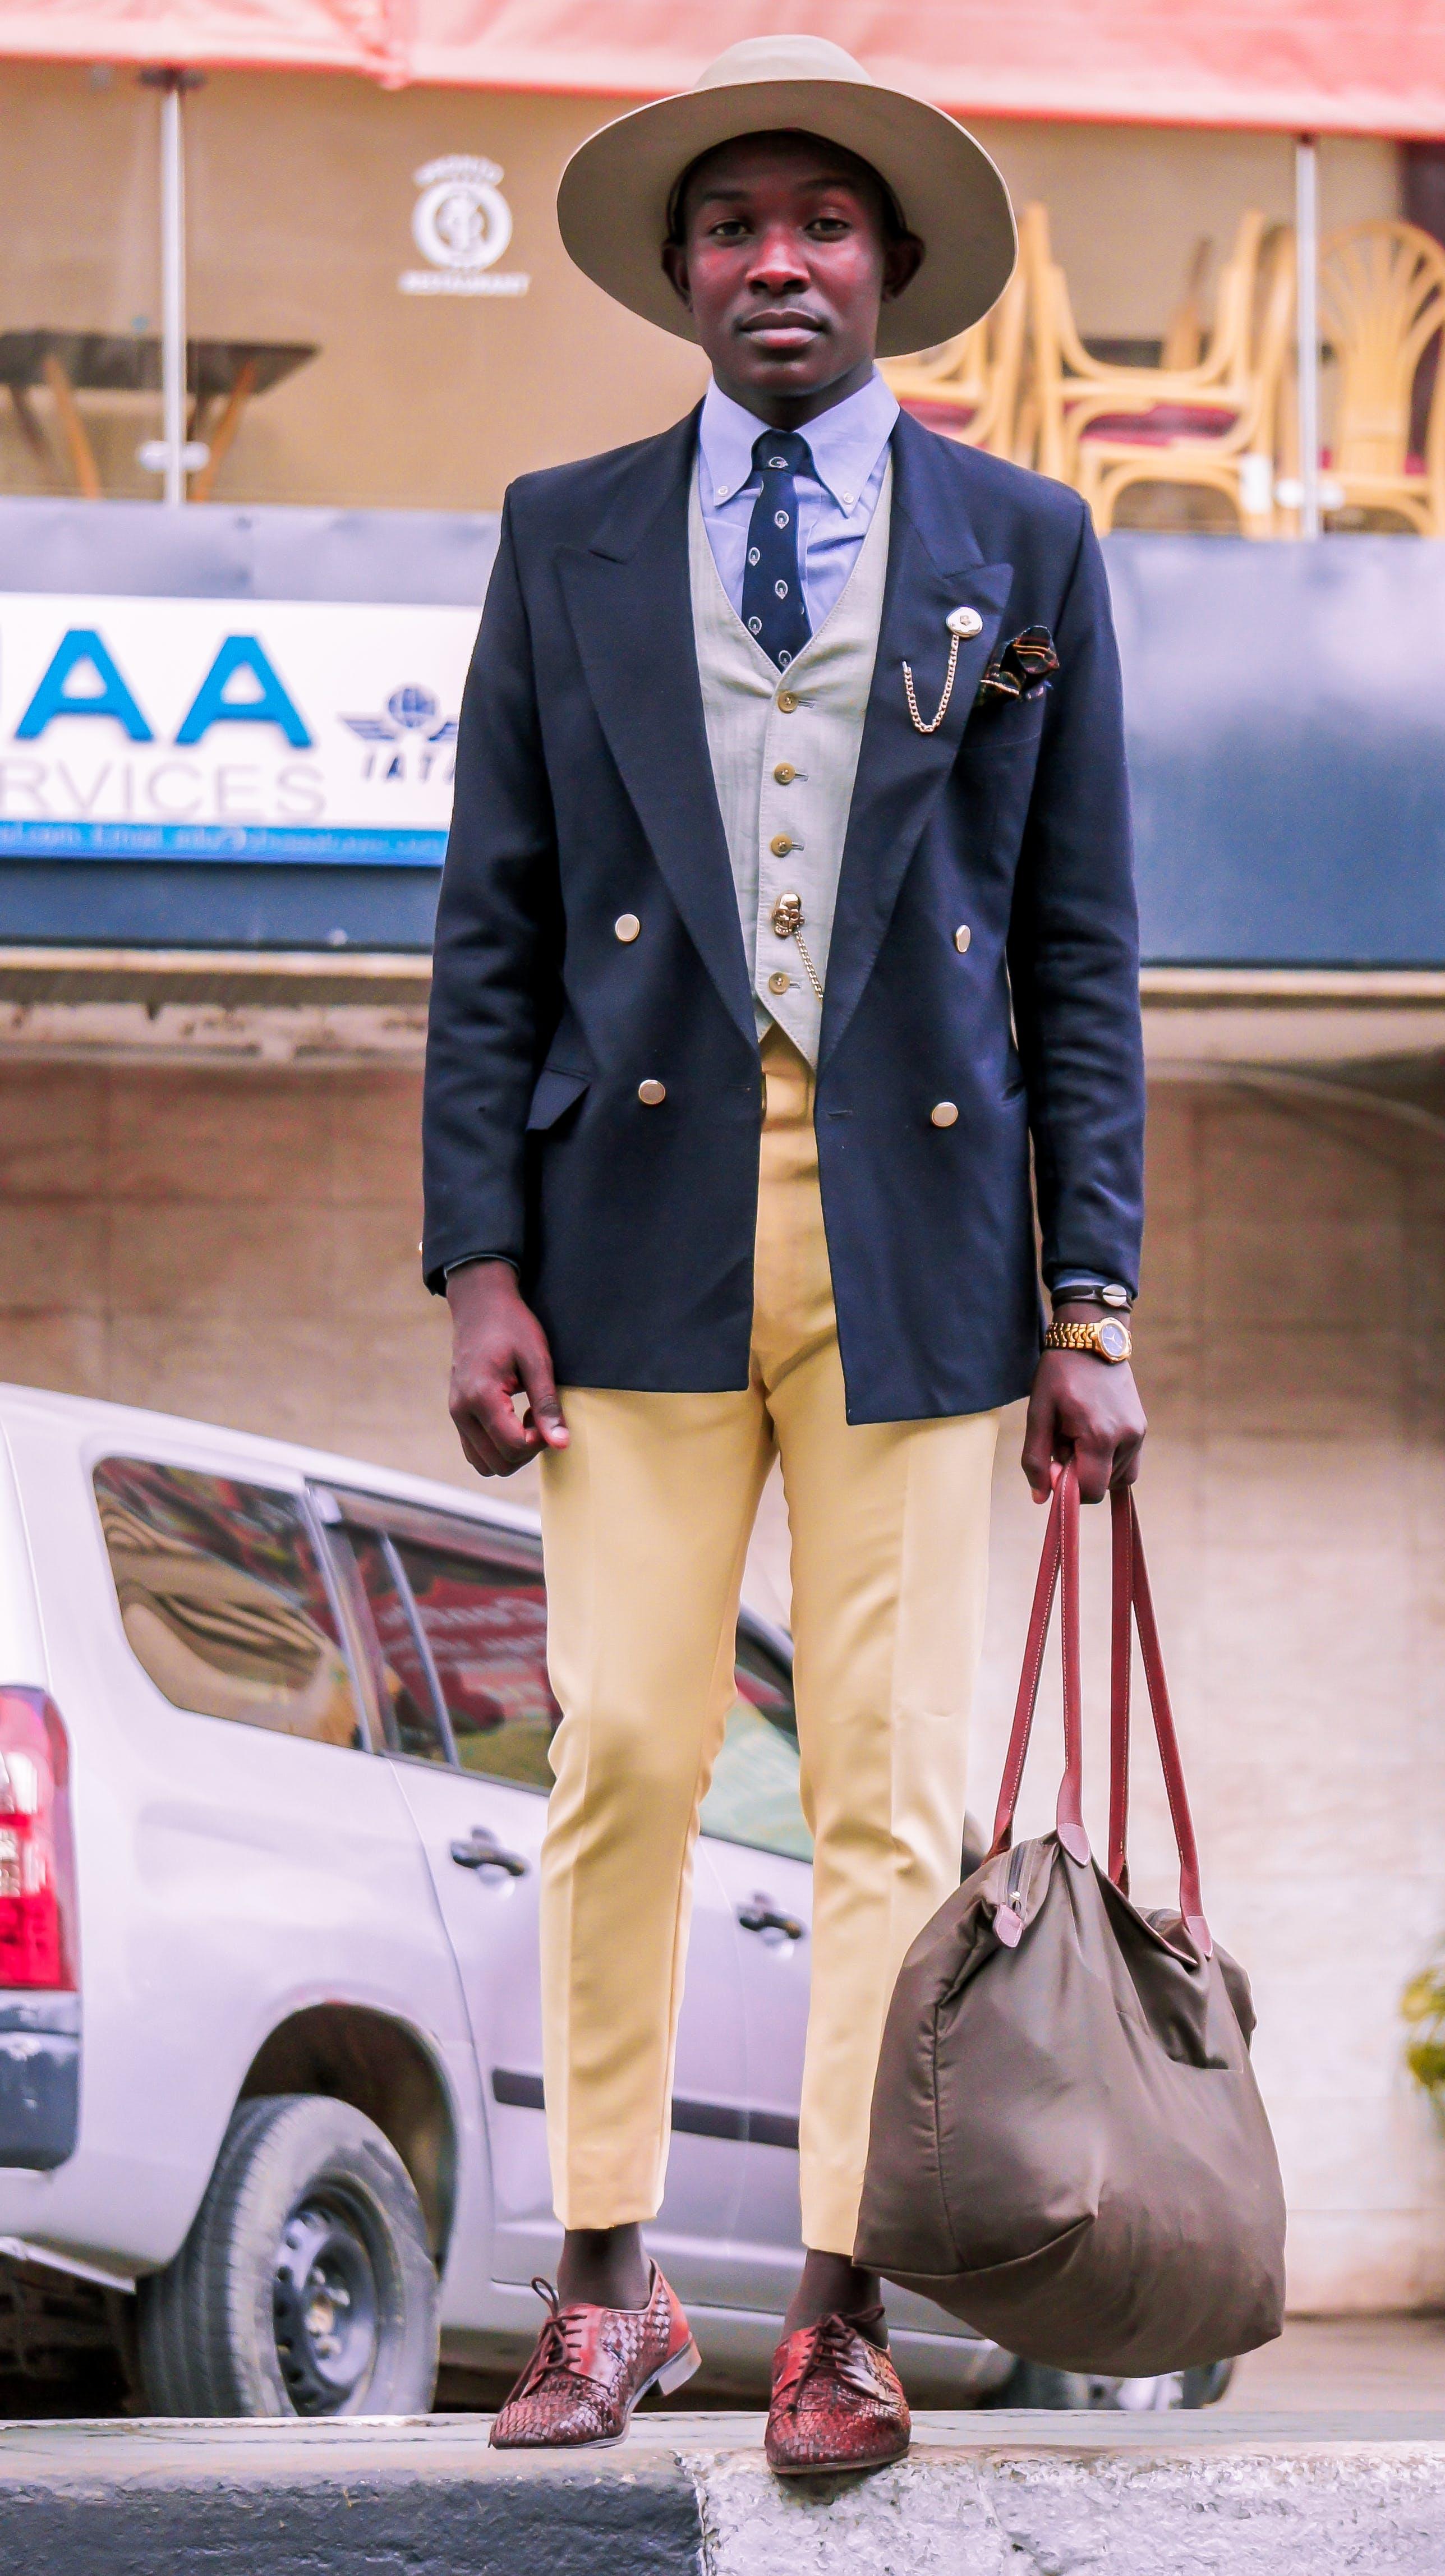 Free stock photo of fashion, man, suit, street